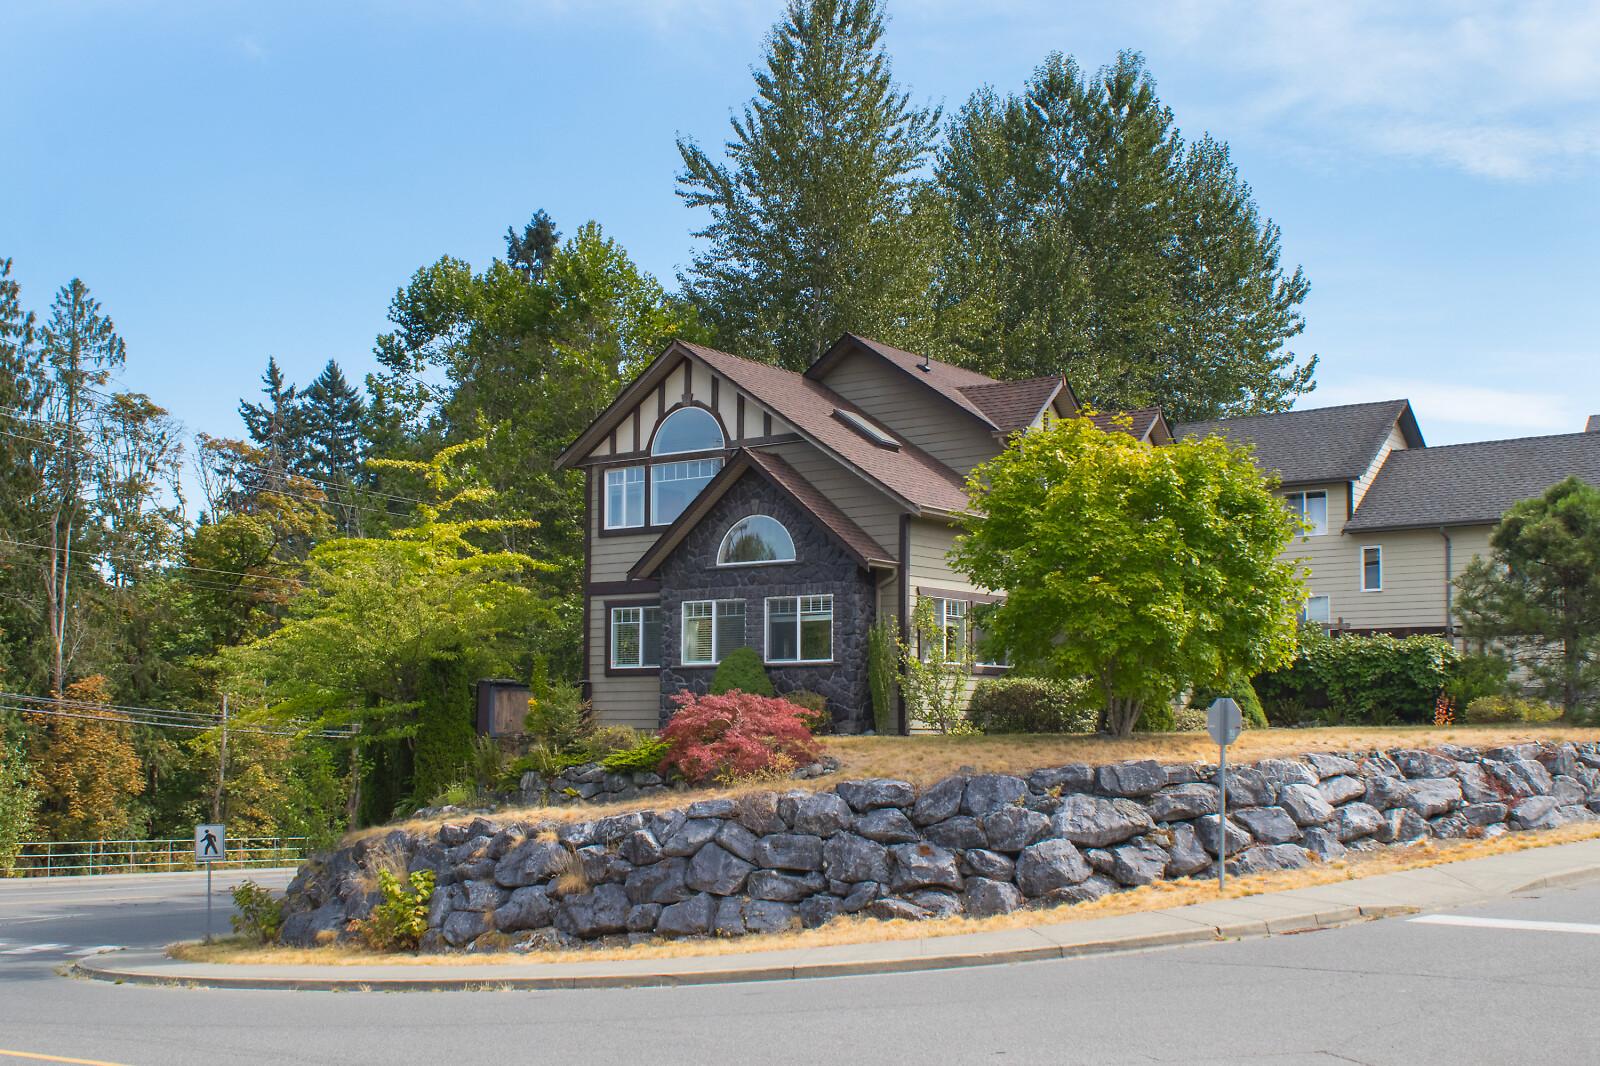 6003 Stonehaven Drive, Duncan, British Columbia  V9L 0A1 - Photo 3 - 885028